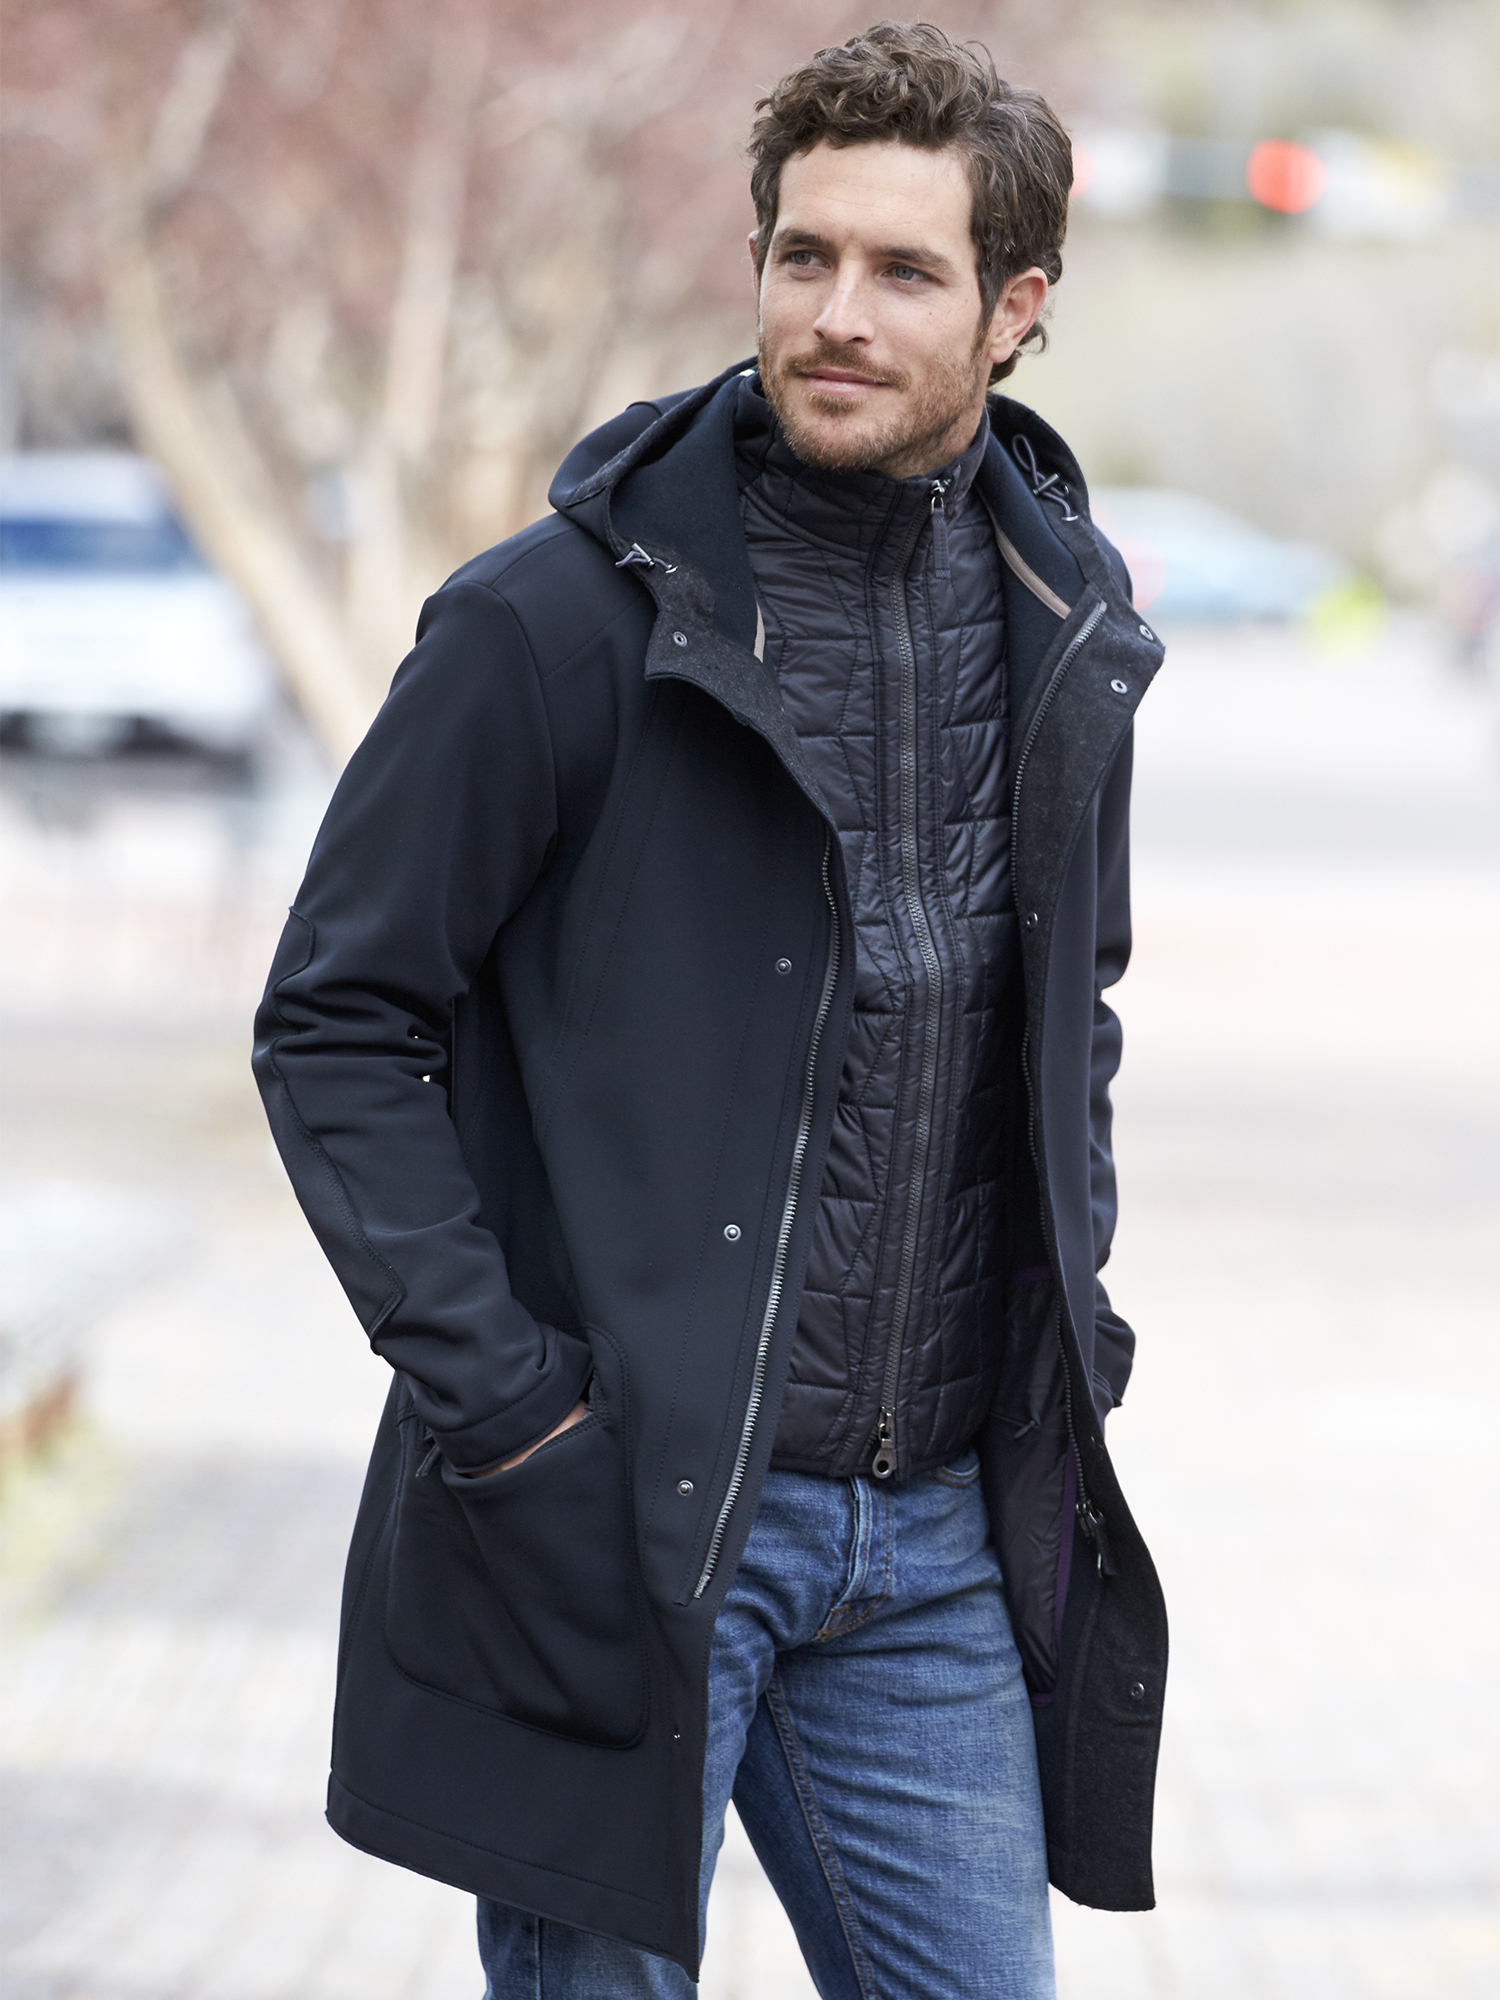 bbe5b0a21ad mens winter coats - Gorsuch